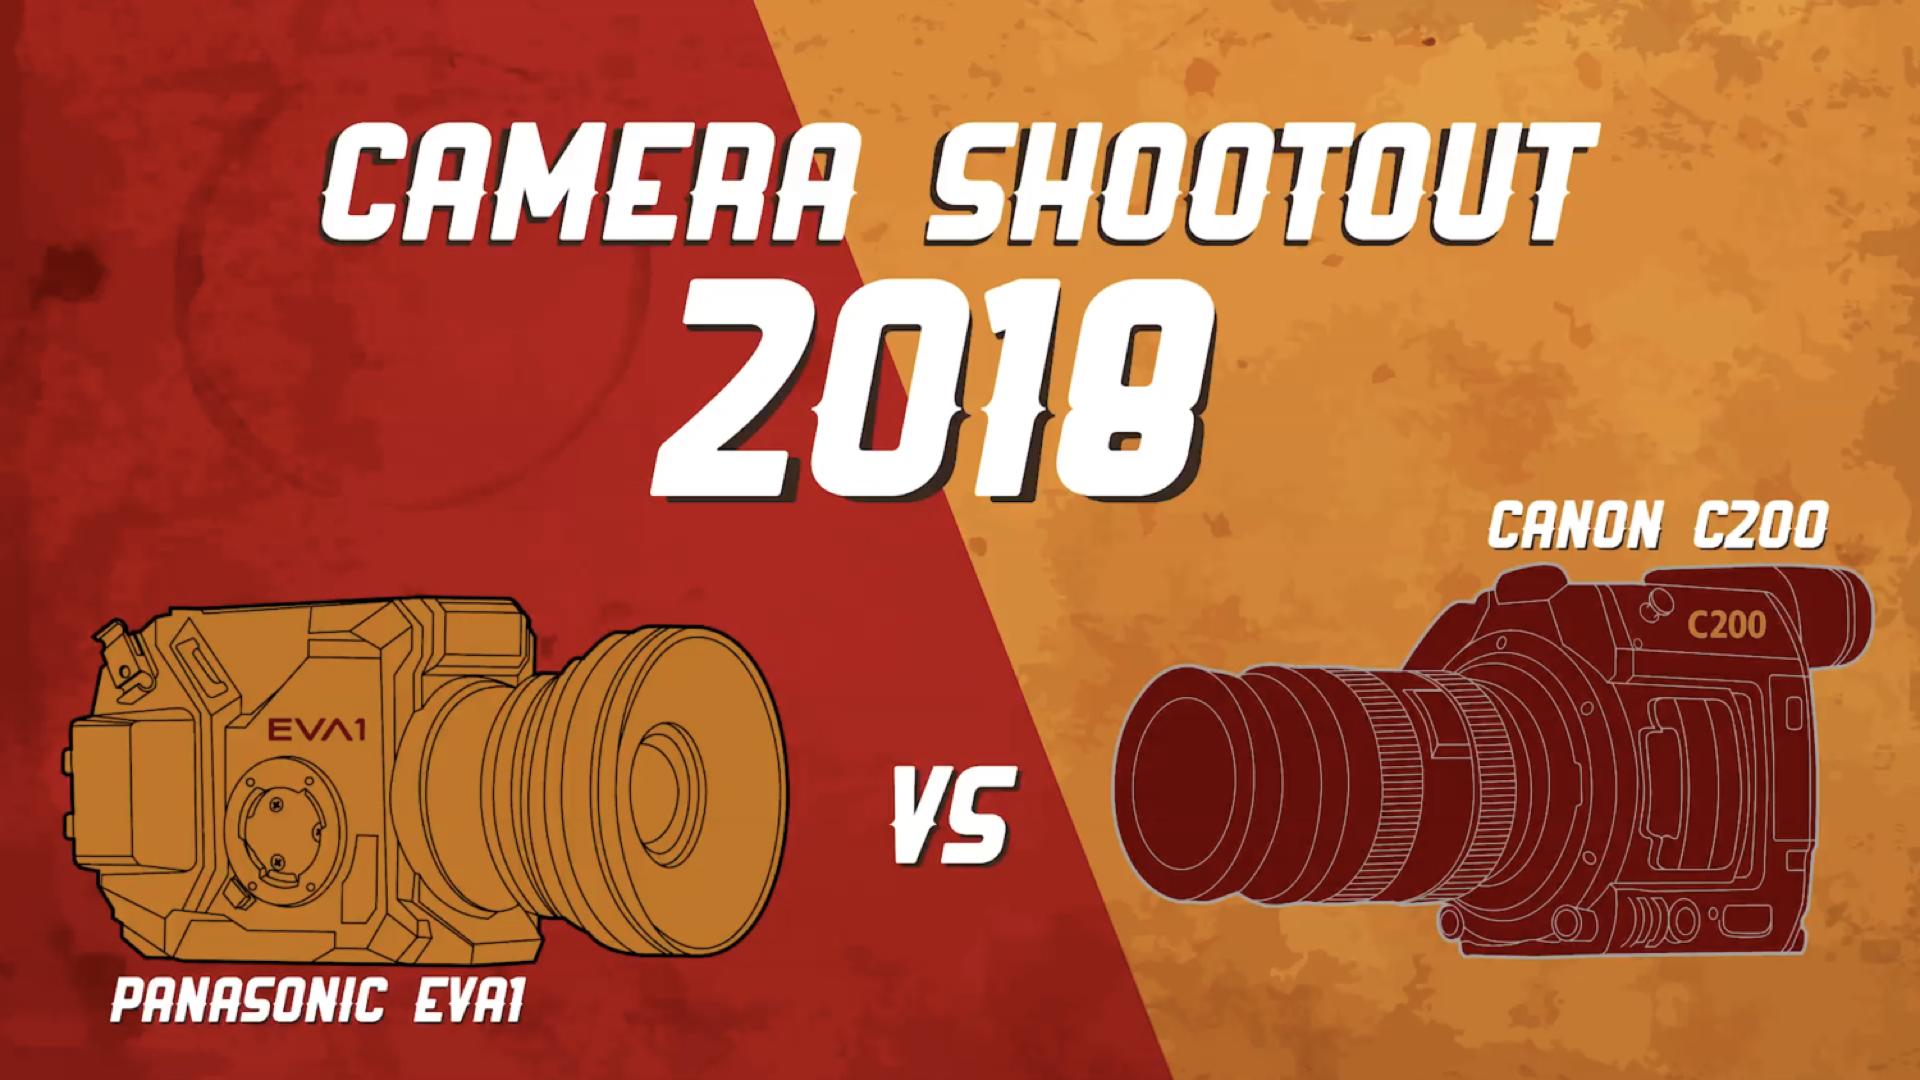 Zacuto Camera Shootout 2018 - キヤノンC200とパナソニックEVA1を徹底比較する